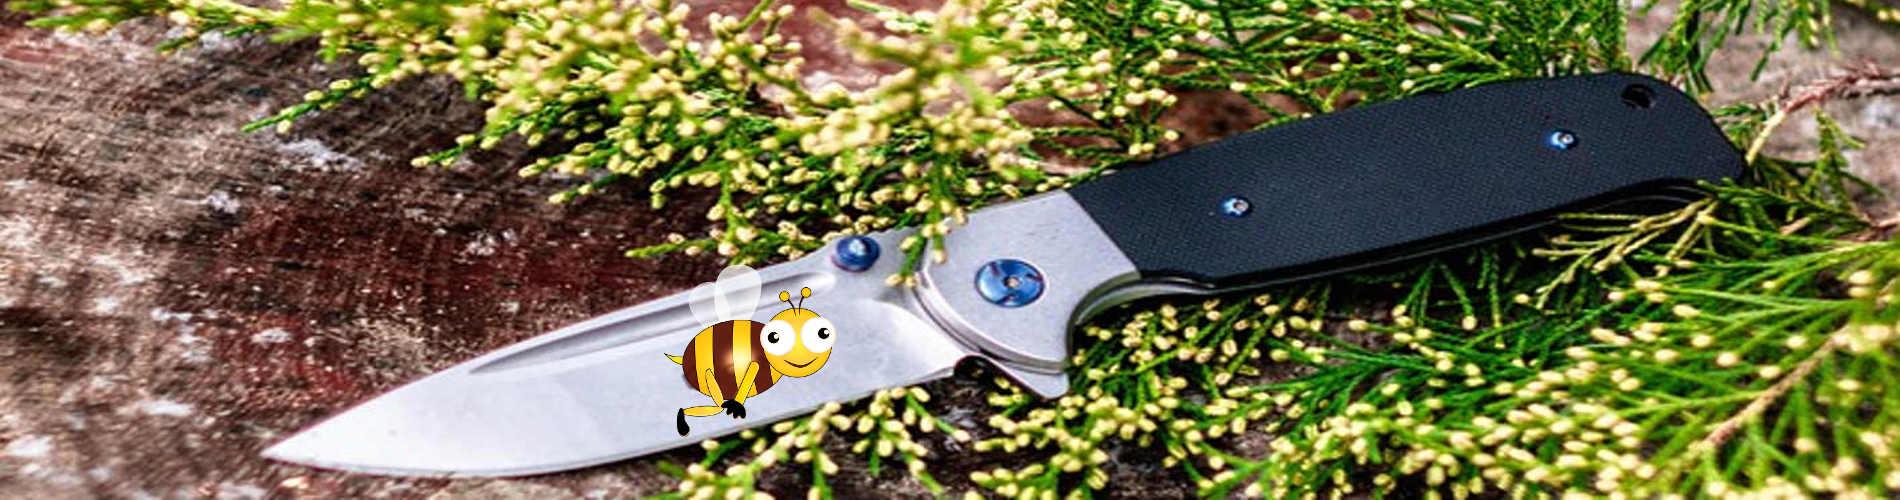 L'agenda de l'apiculteur